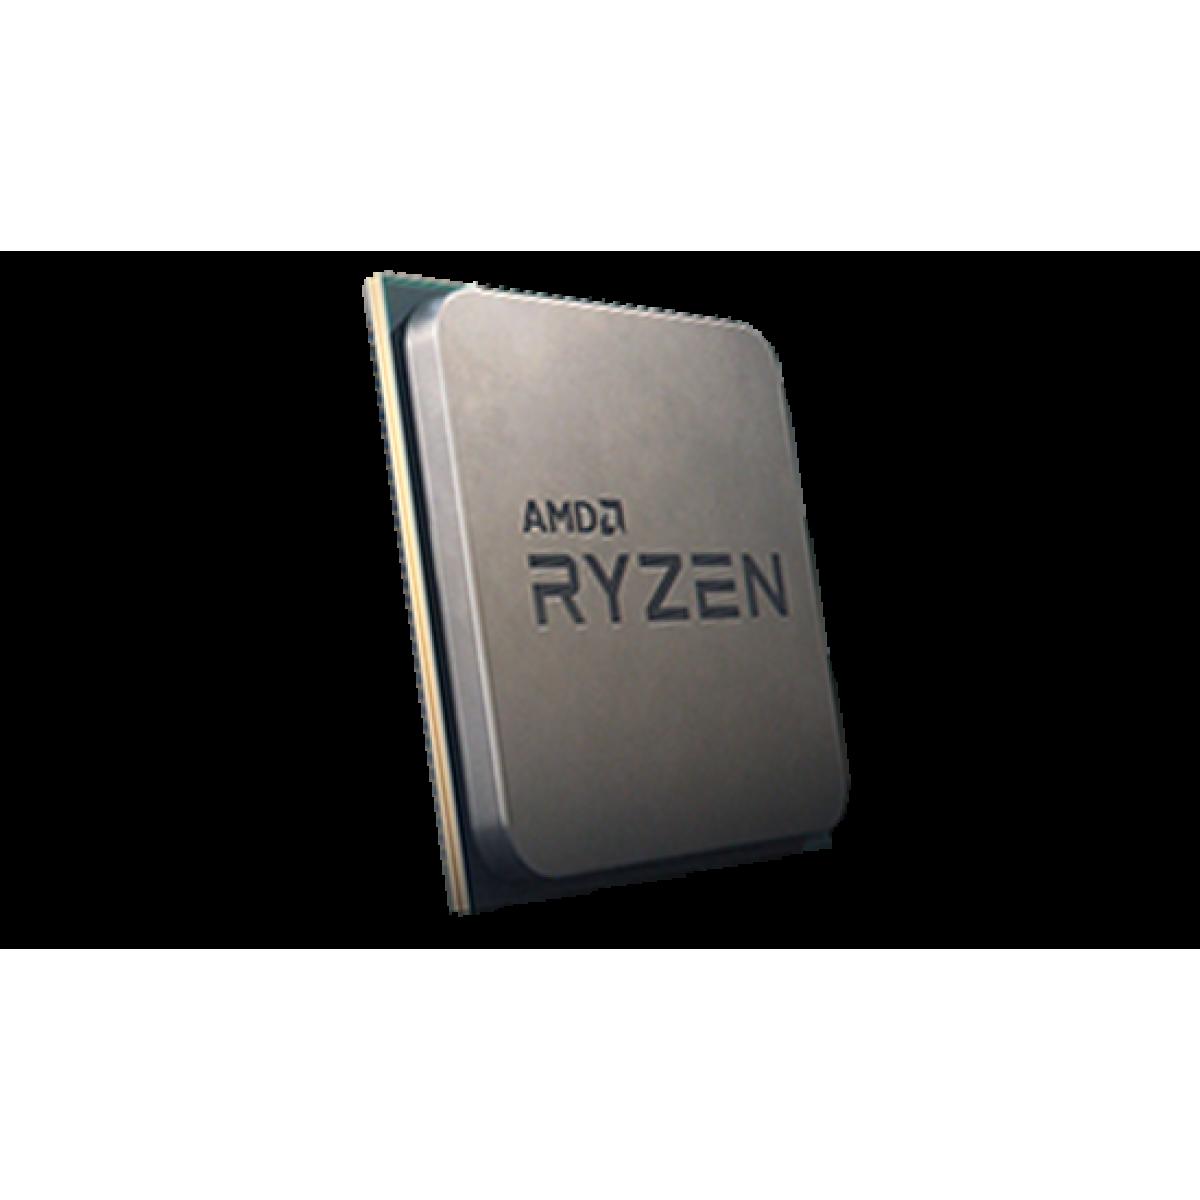 Processador AMD Ryzen 9 3900x 3.8ghz (4.6ghz Turbo), 12-cores 24-threads, AM4, S/ Video, S/Cooler